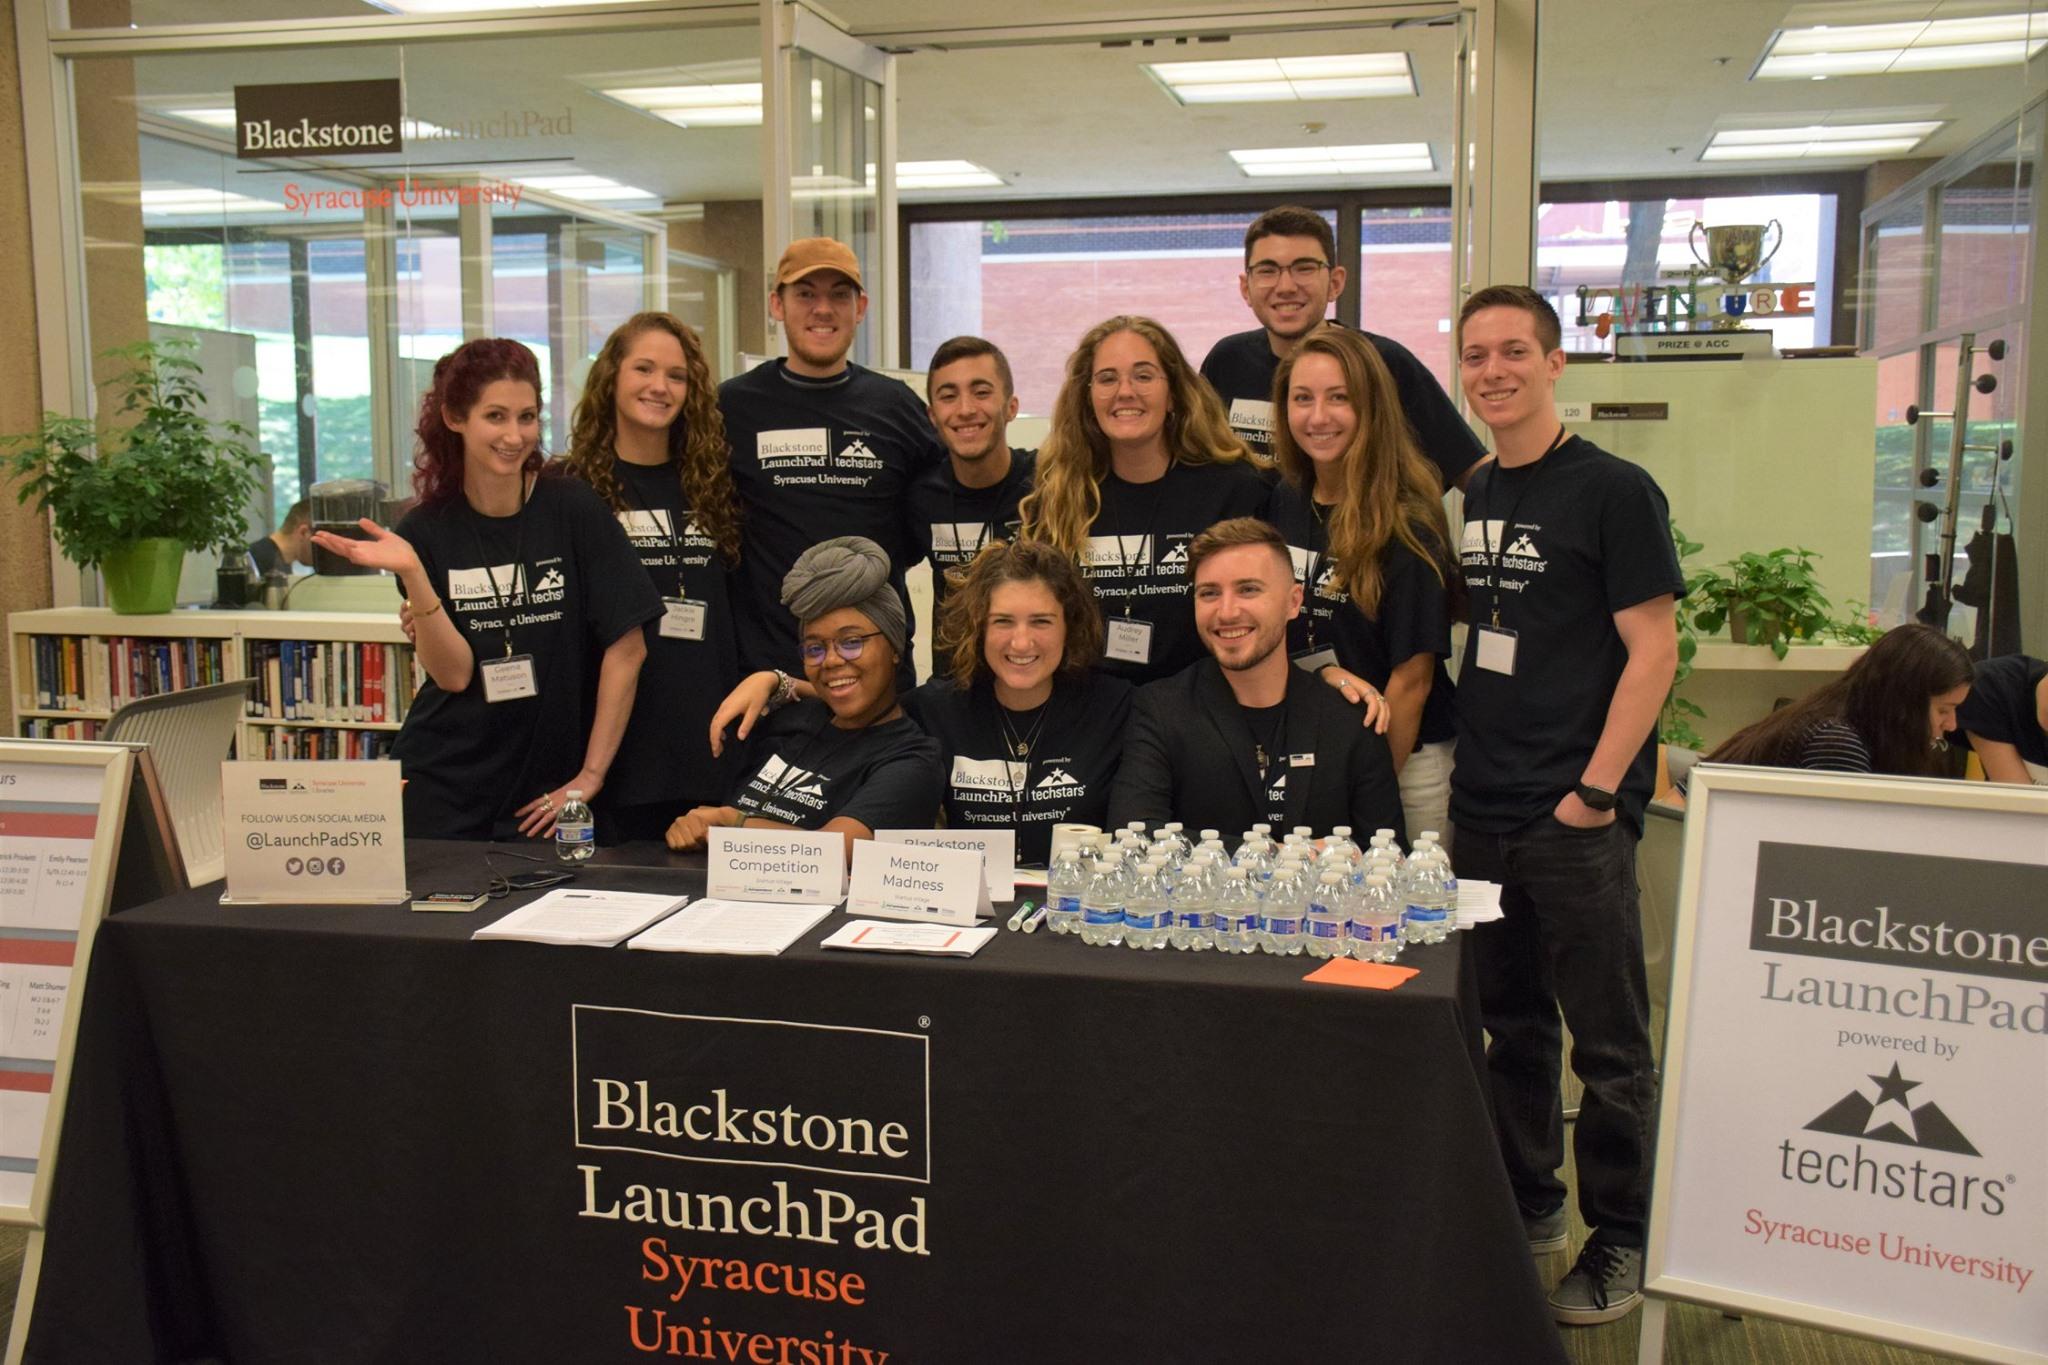 Techstars Startup Weekend with the Syracuse University Blackstone LaunchPad in 2019 with fellows and mentors including Geena Matuson (@geenamatuson) with Jaclyn Hingre, Patrick Prioletti, Victoria Lawson, Nick Barba, Emma Rothman, Audrey Miller, Sam Holland, Alexandra Cianfarani, Dave Fox, and Matt Shumer of Visos VR.